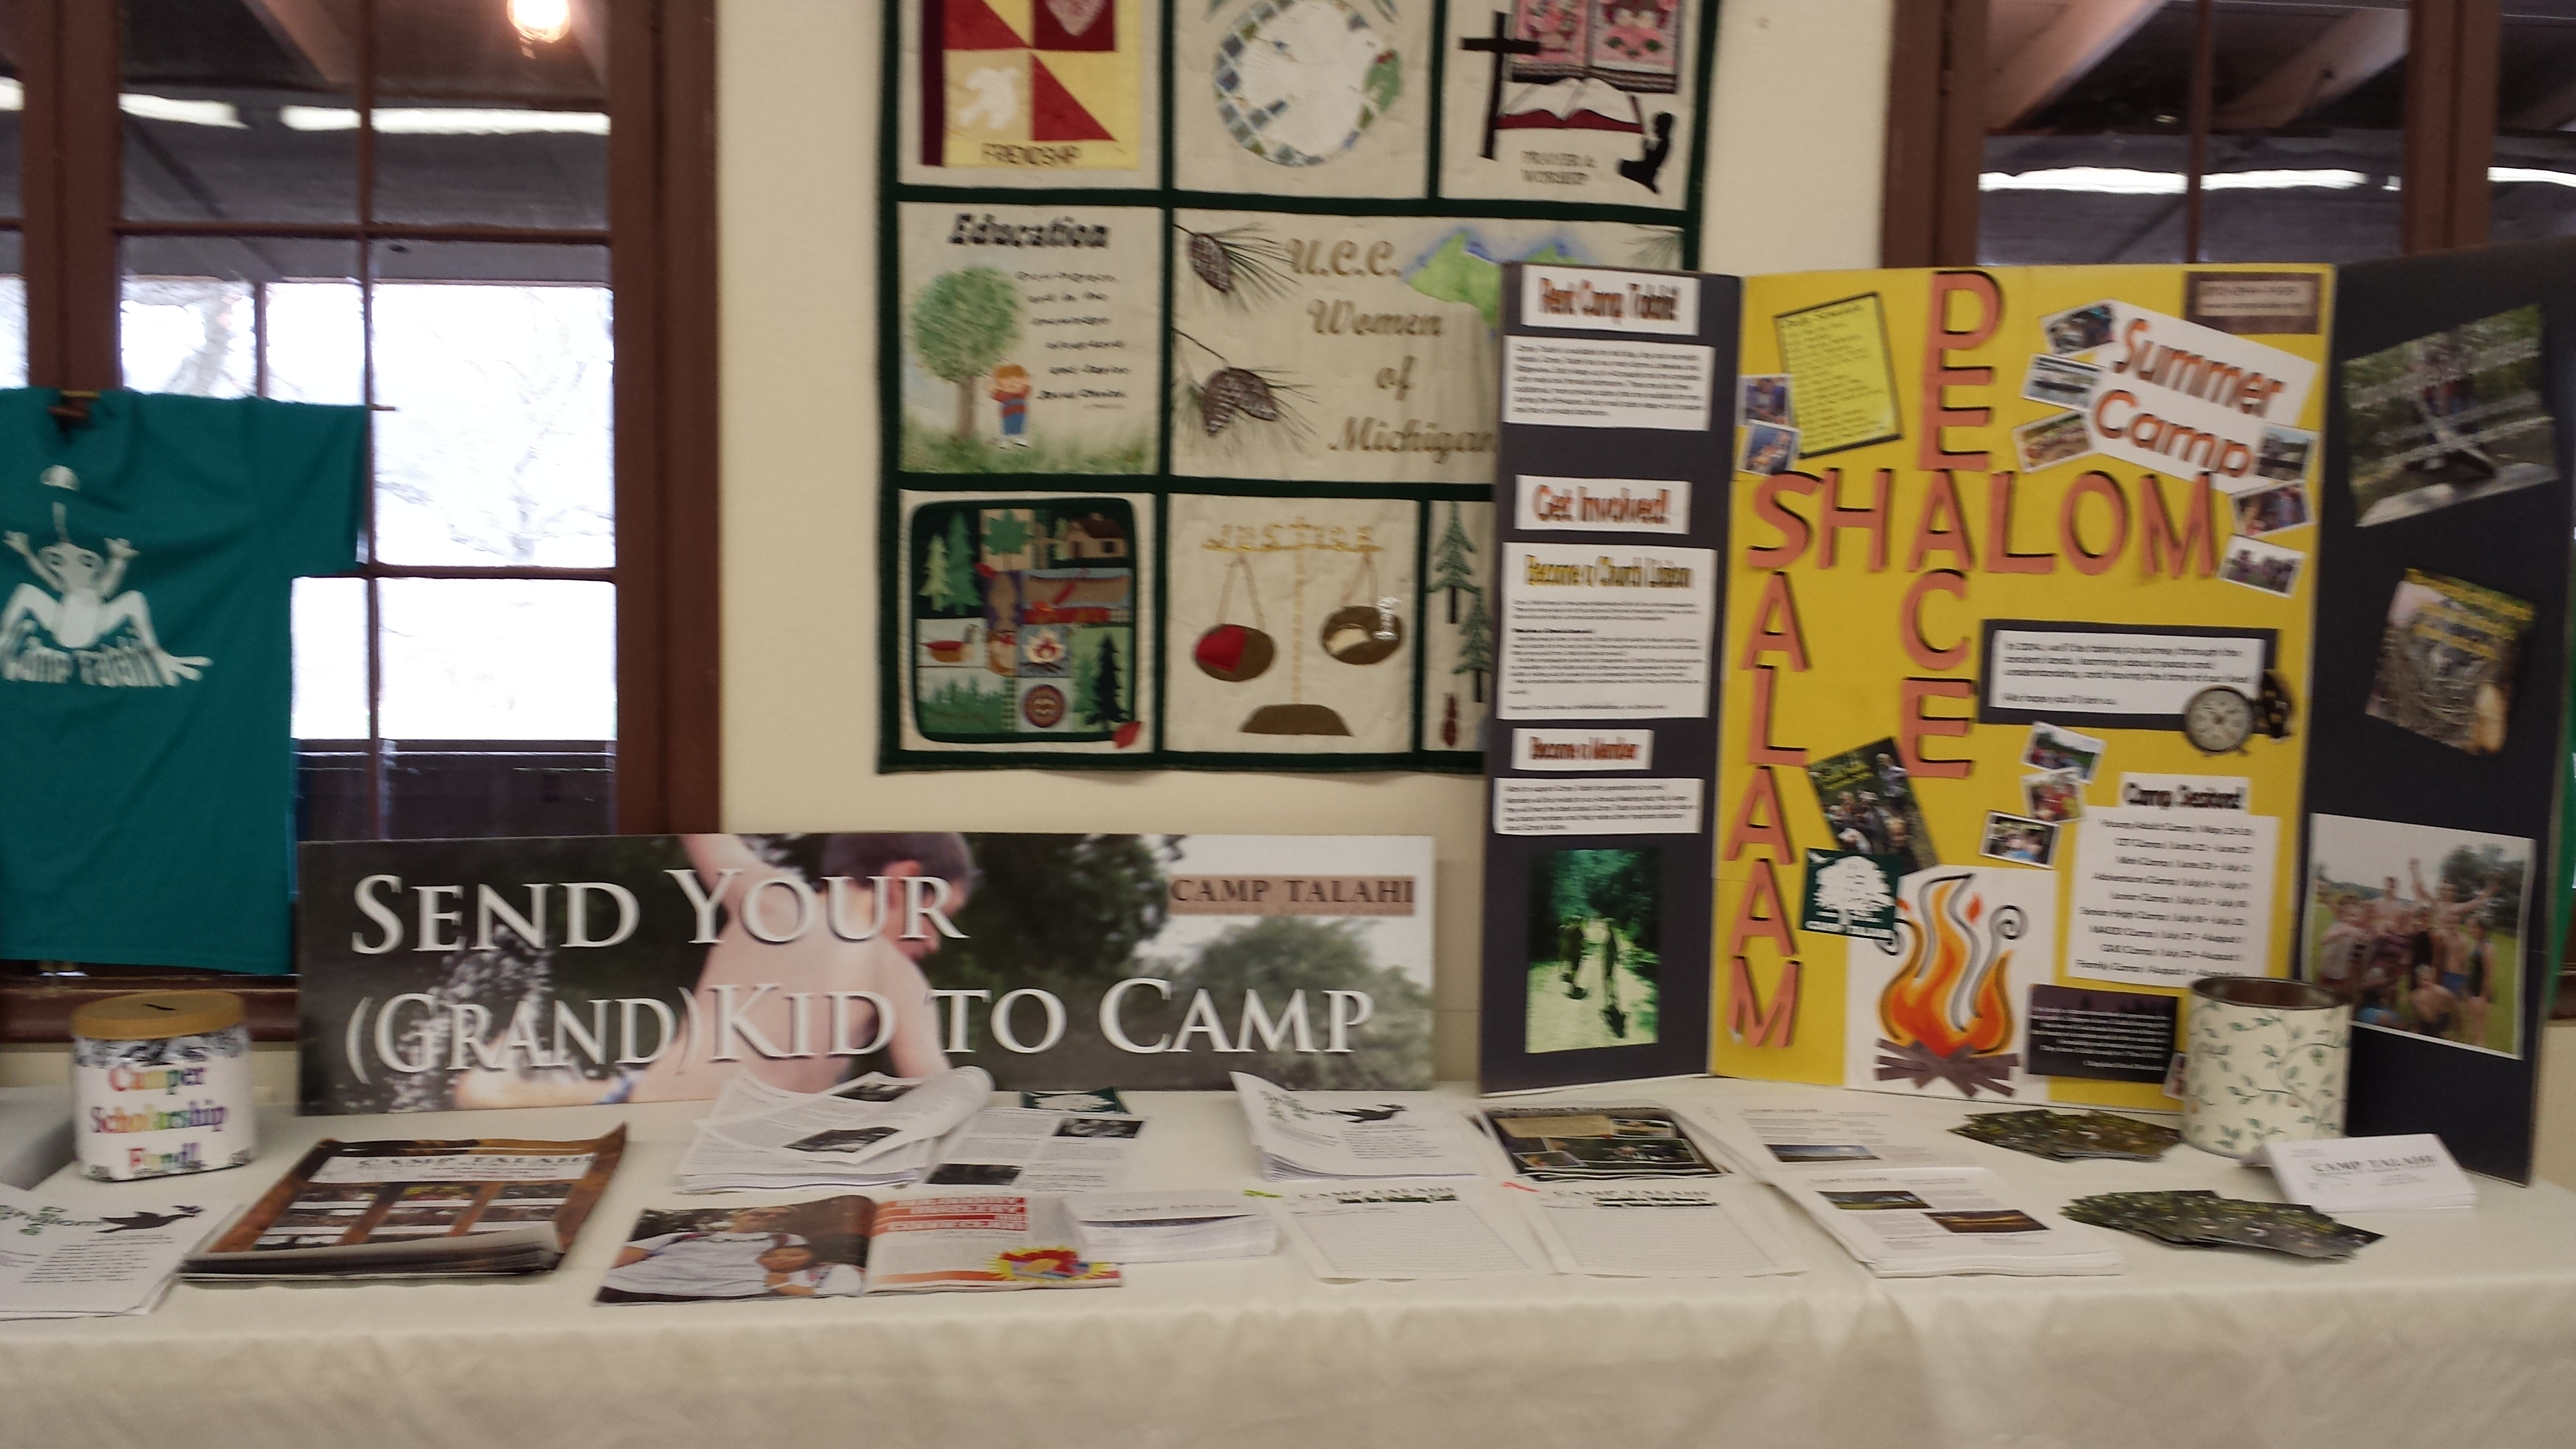 Camp information!